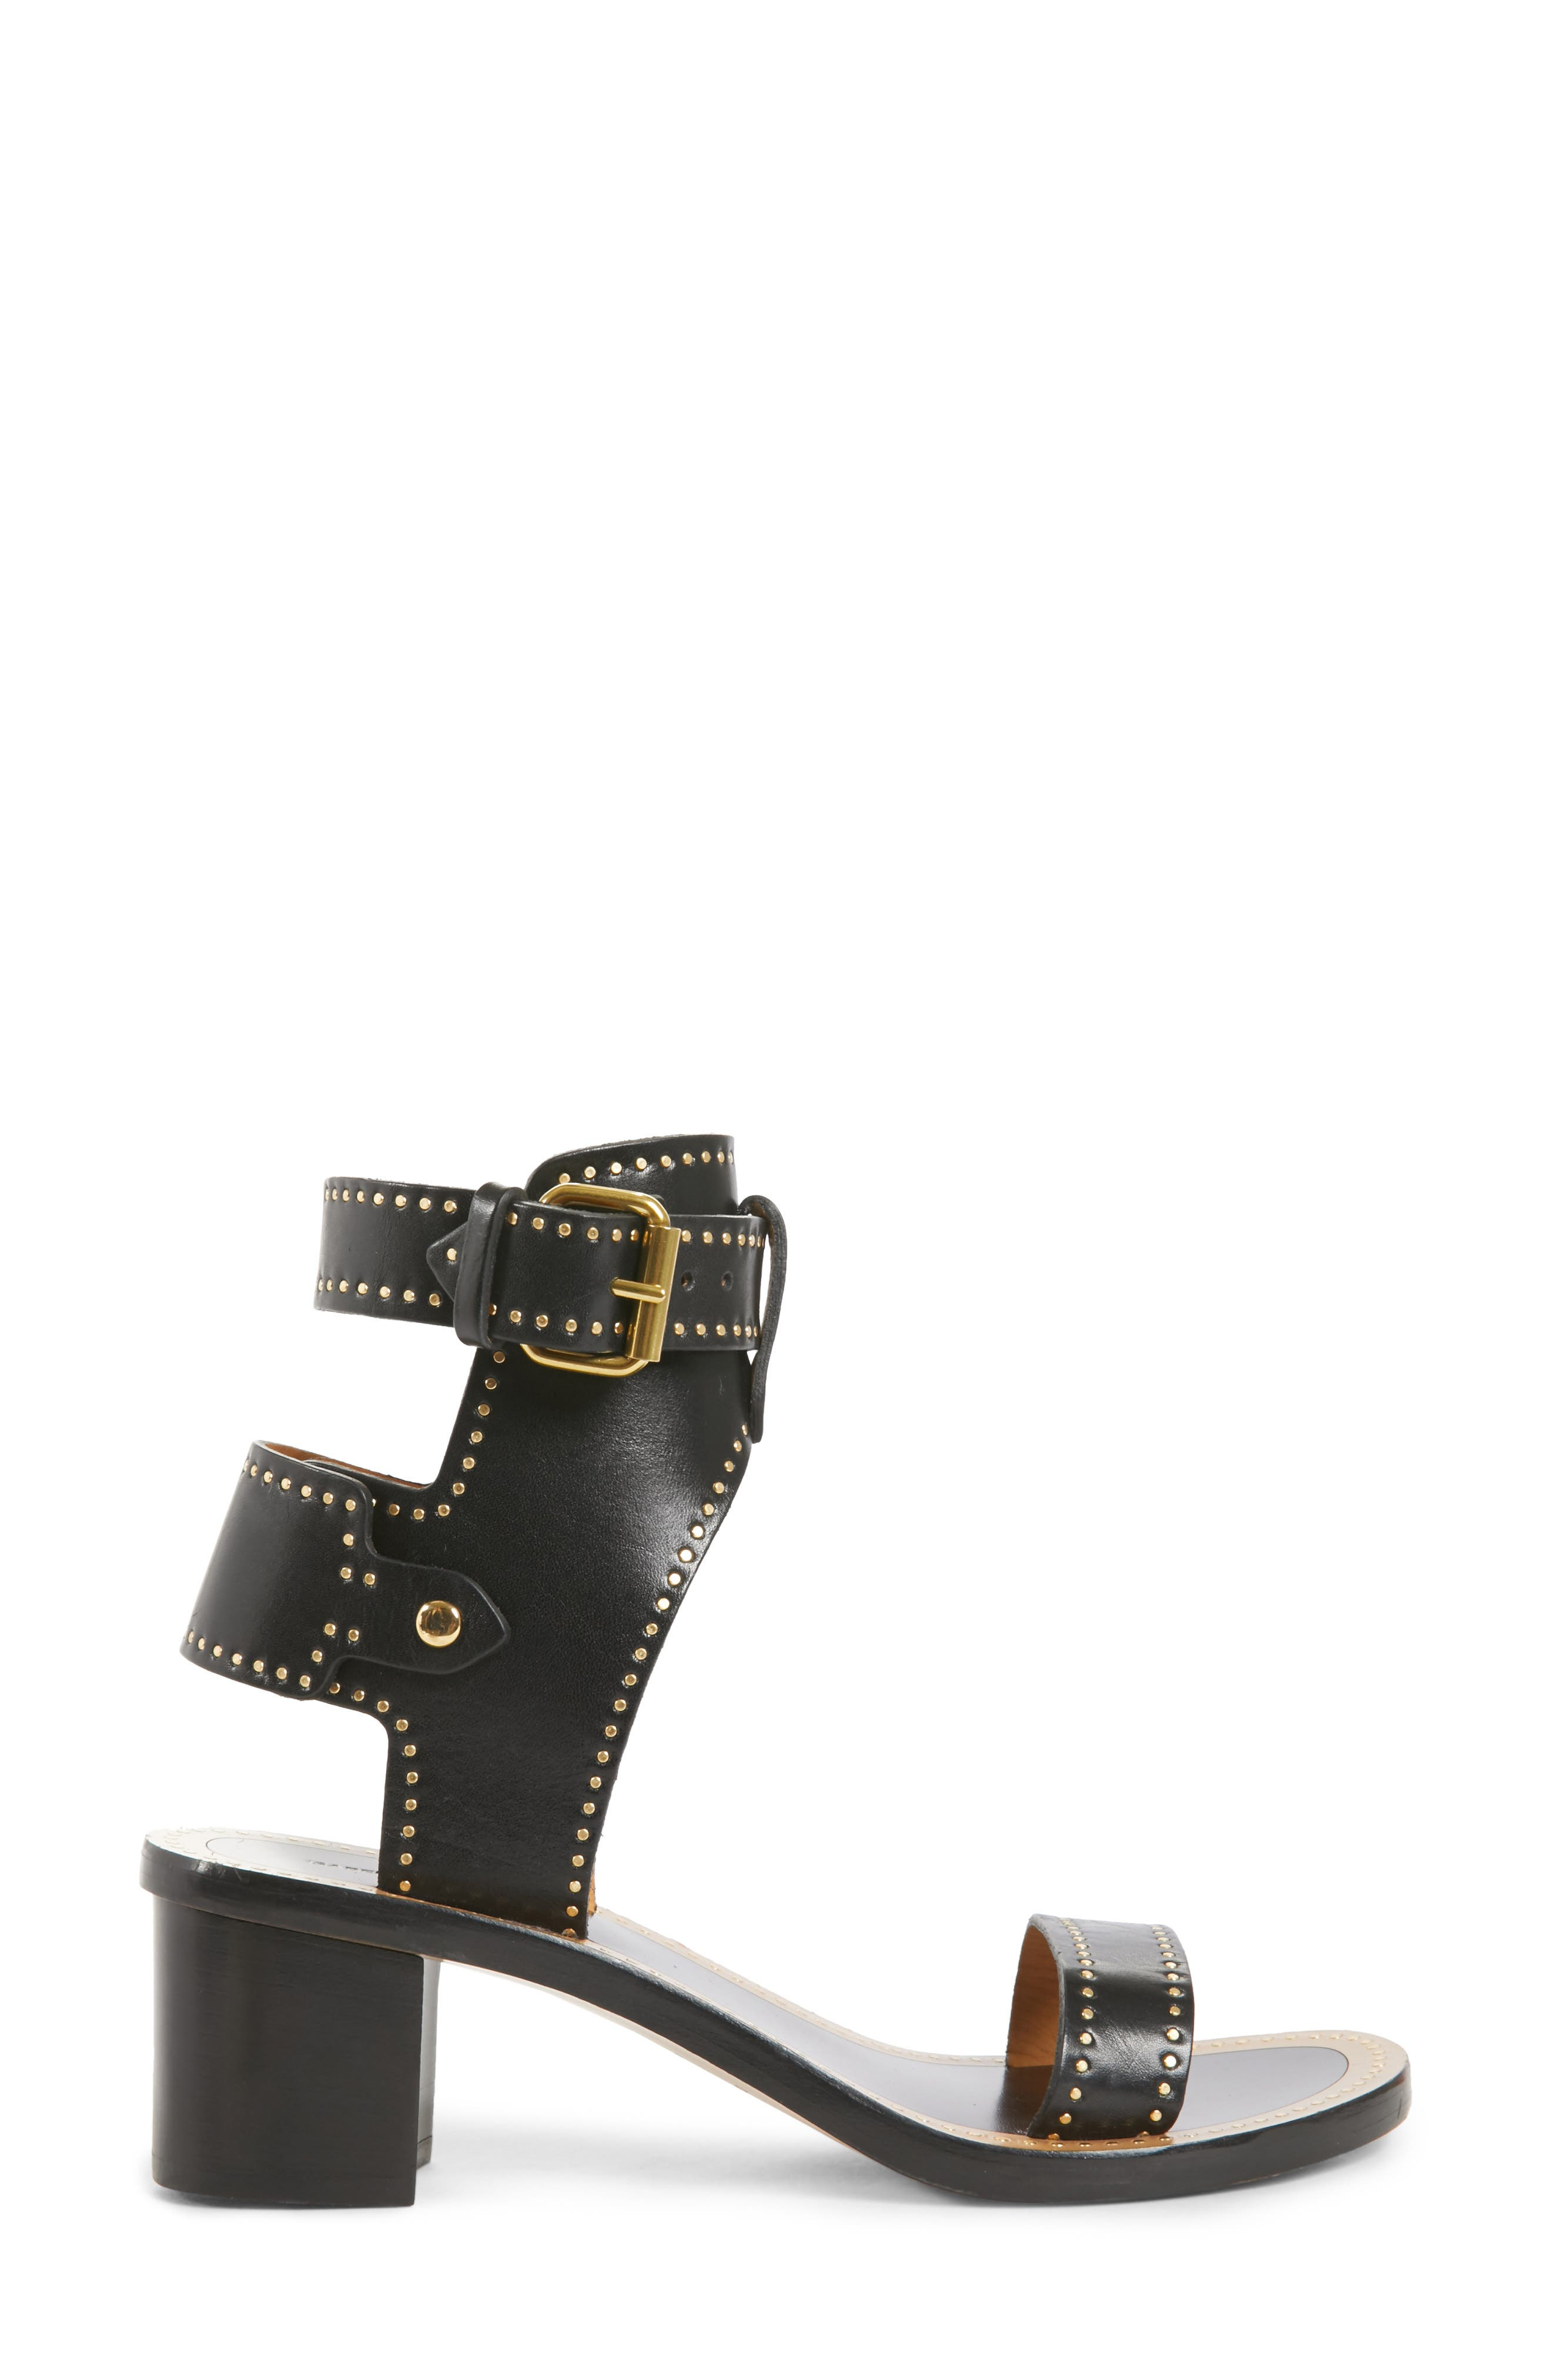 Jaeryn Studded Ankle Strap Sandal,                             Alternate thumbnail 3, color,                             BLACK LEATHER